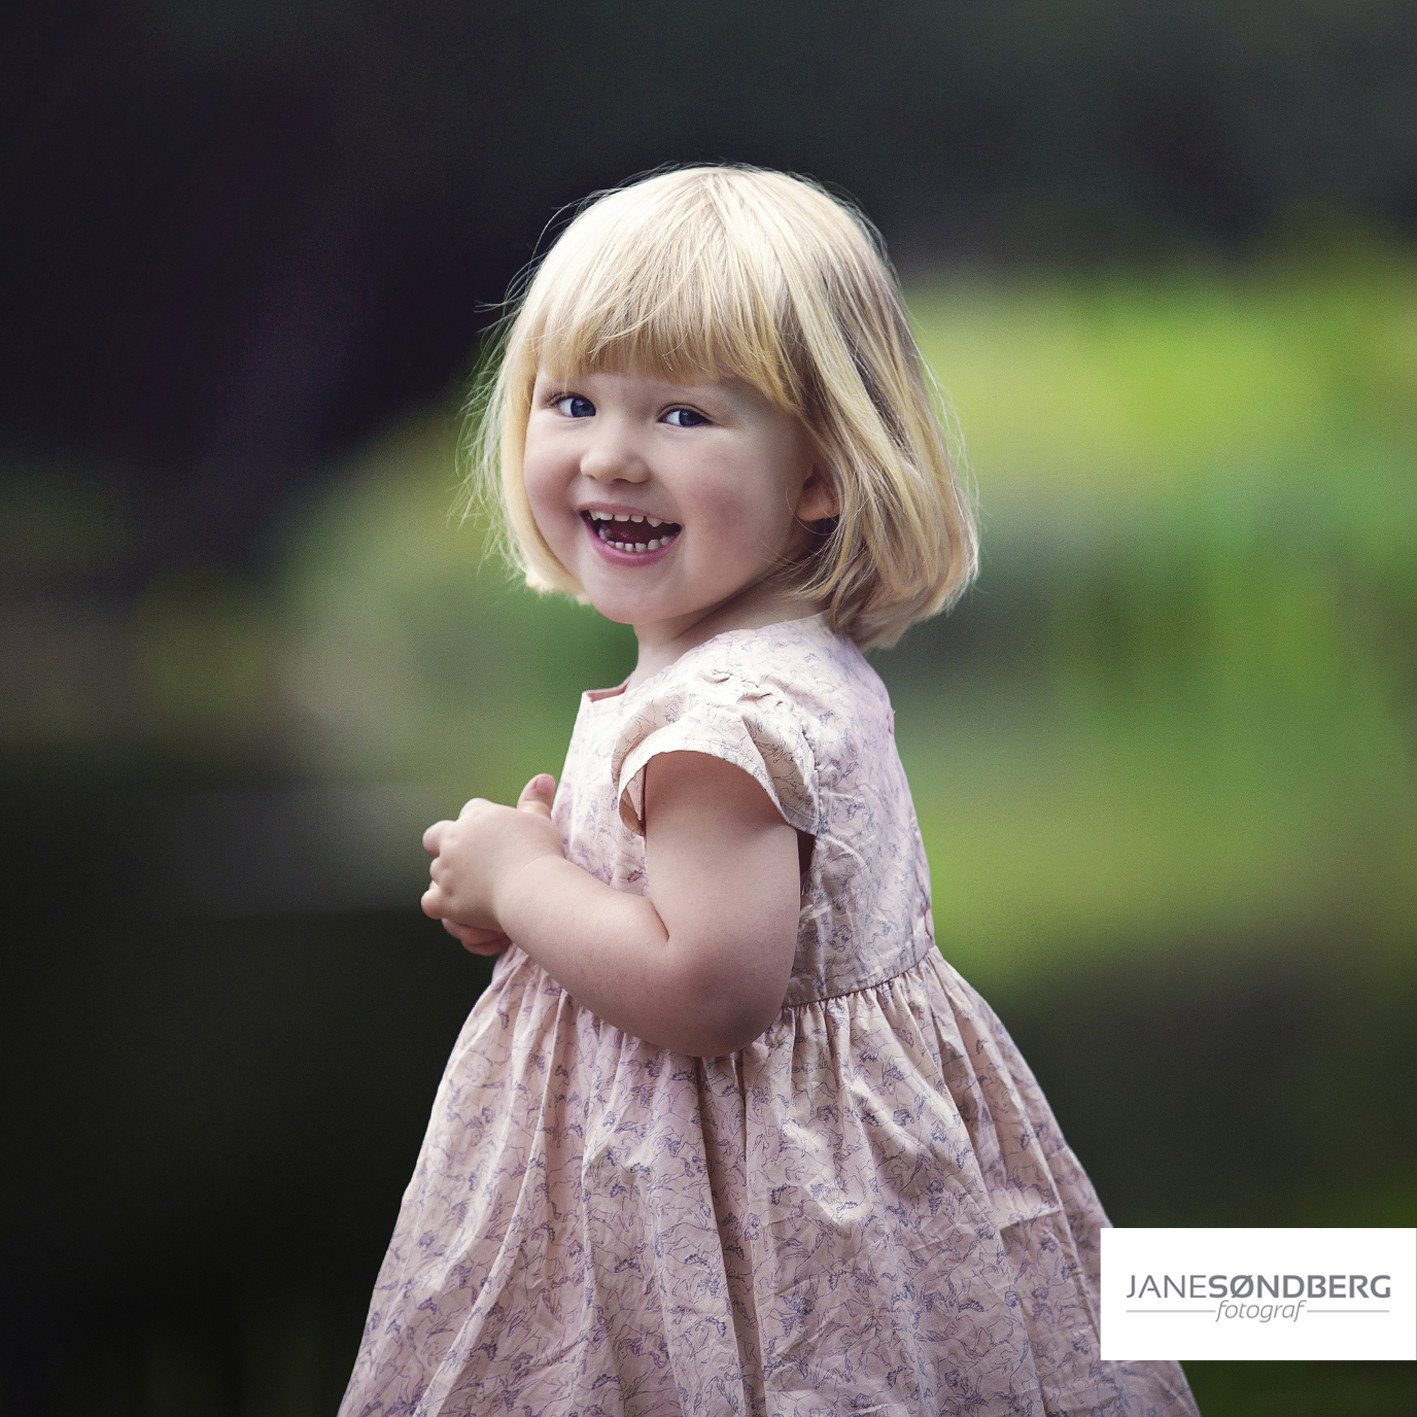 Barn/teen Photoshoot i det fri - Silkeborg